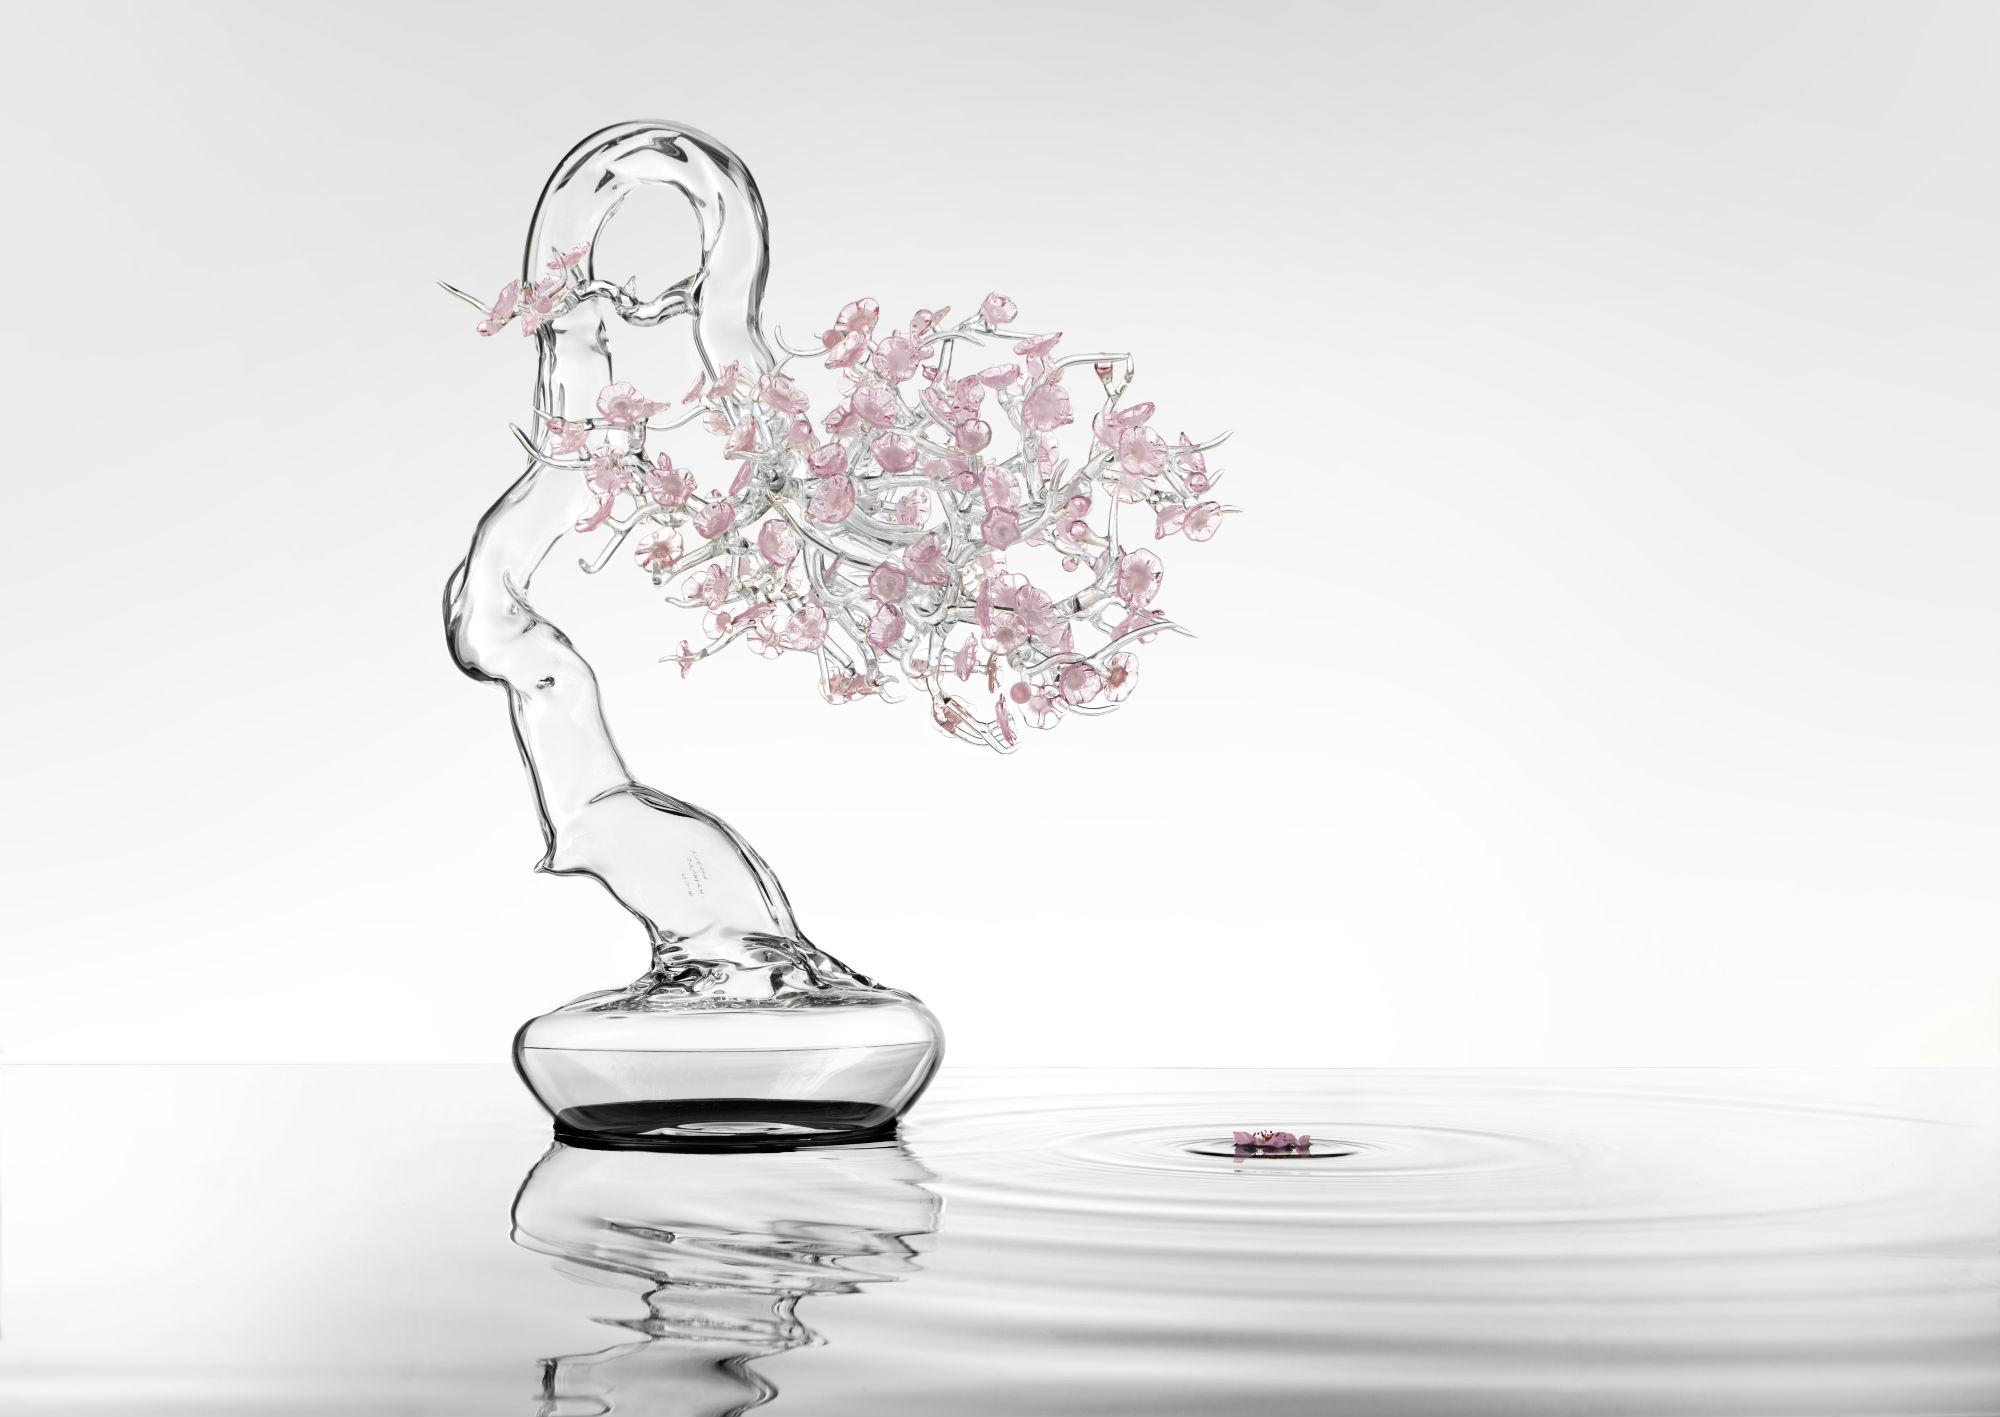 Simone_Crestani_bonsai_Sakira (2)